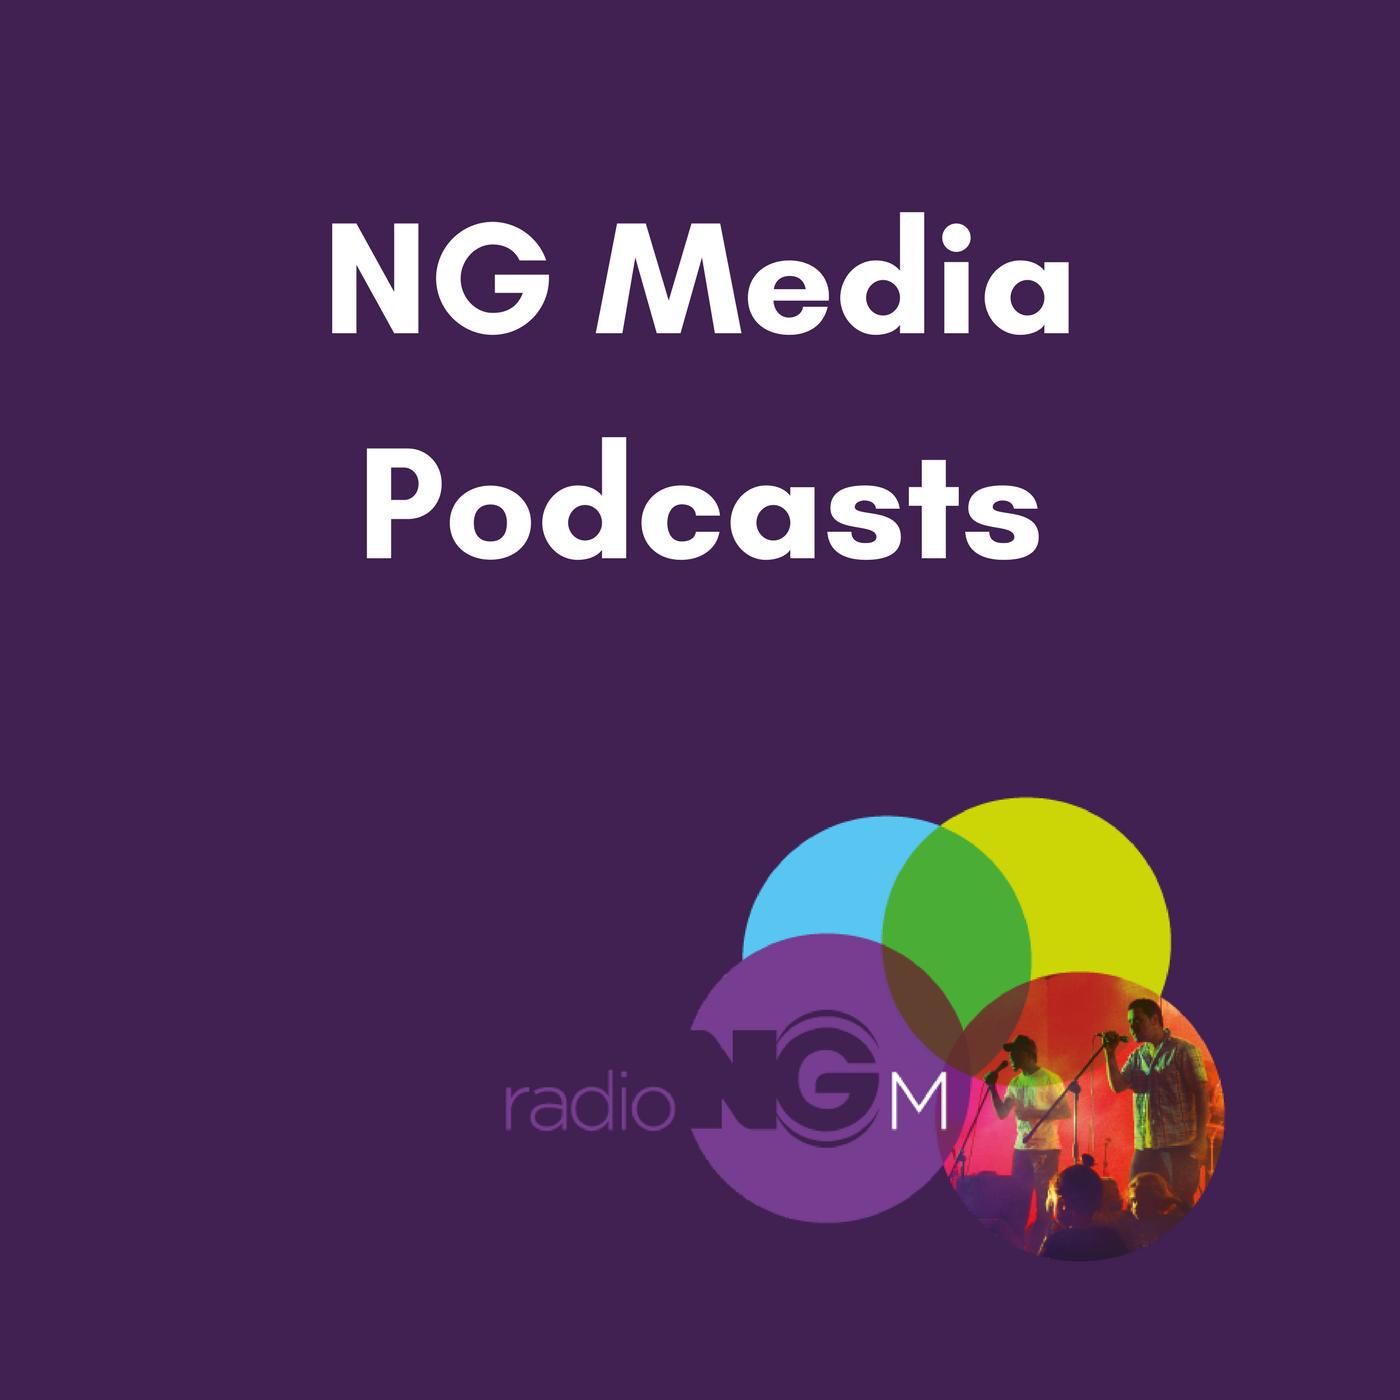 NG Media Podcasts show art